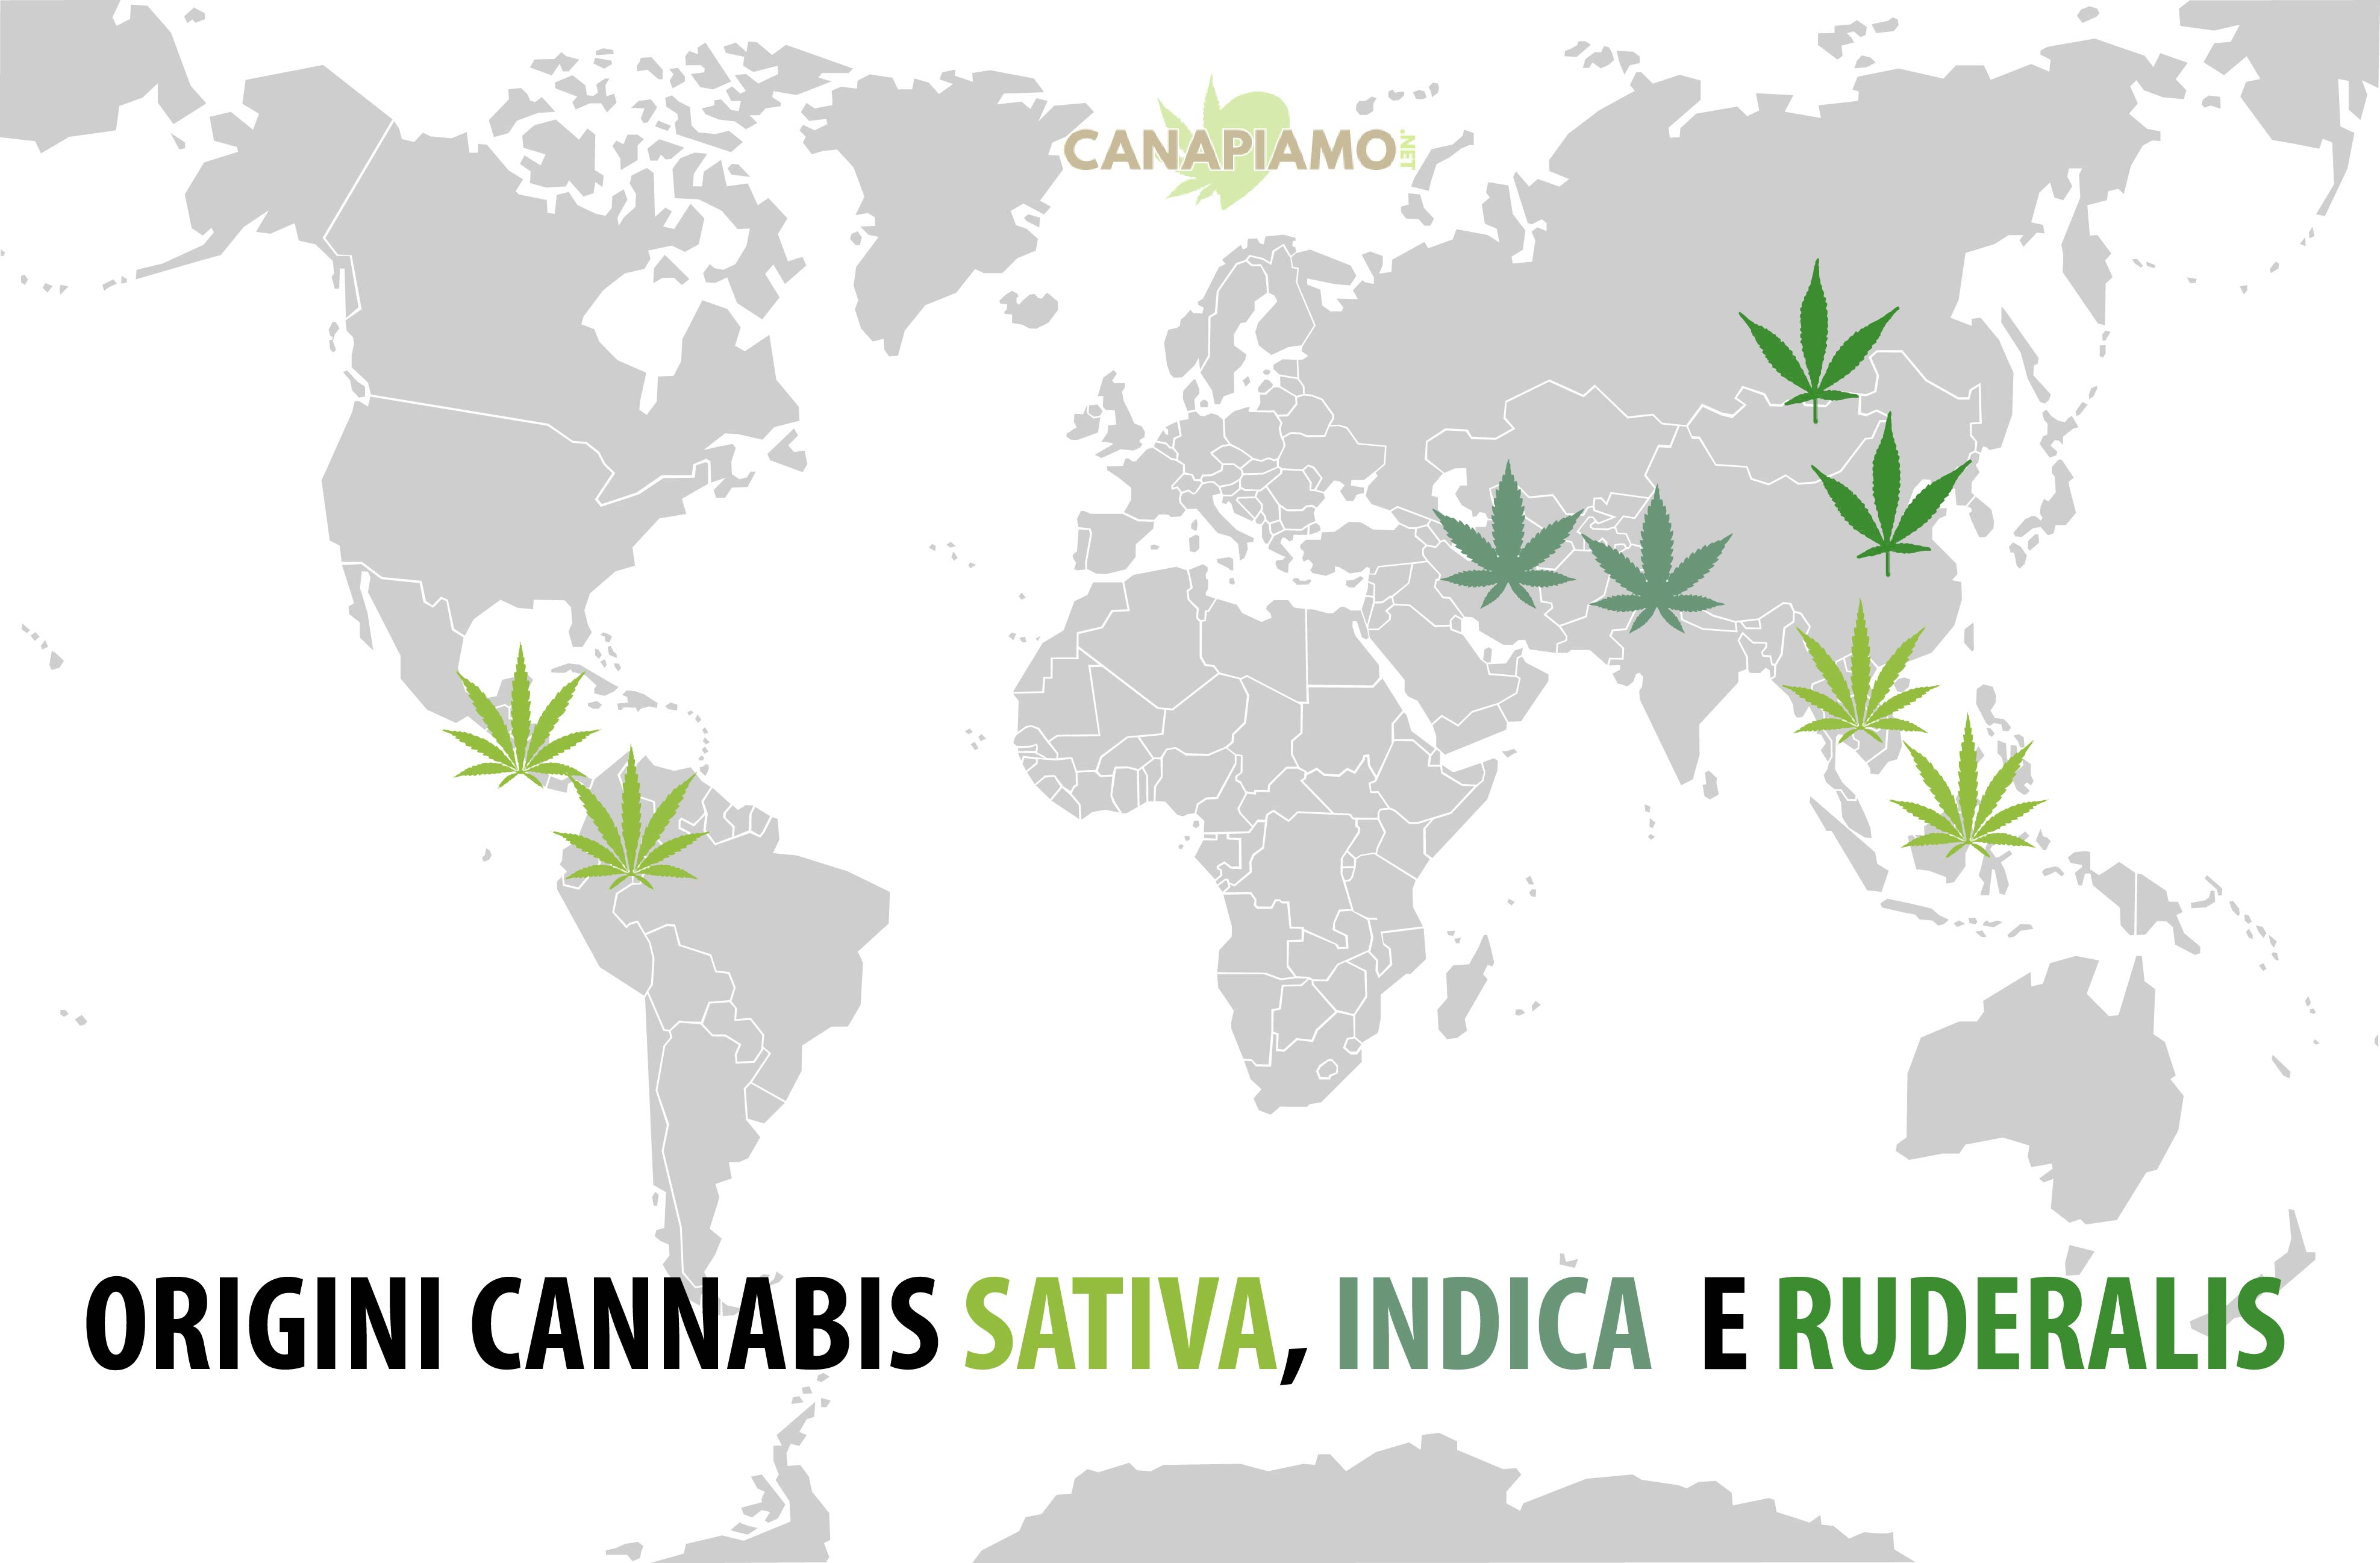 Cannabis Sativa Indica Ruderalis mappa